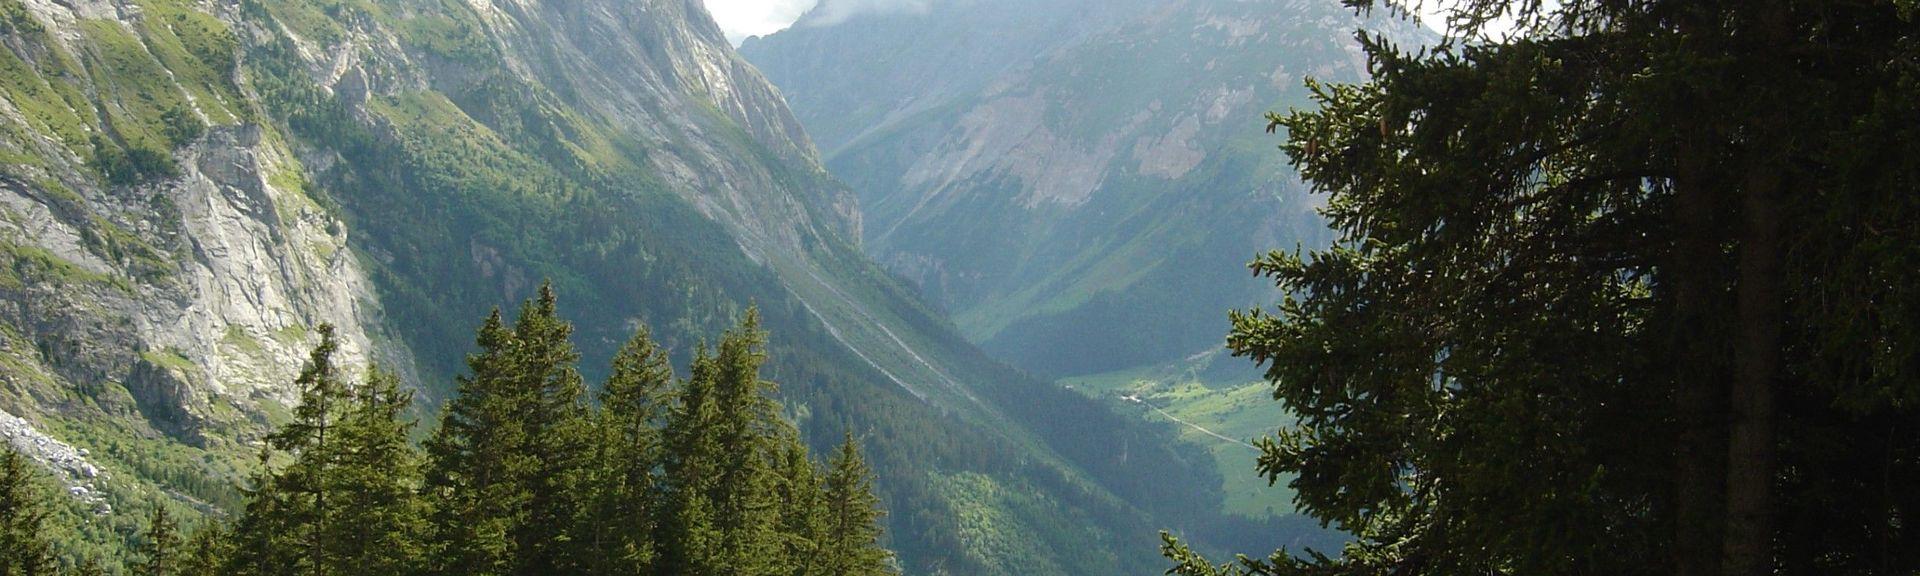 Termignon, Savoie (departement), Frankrike